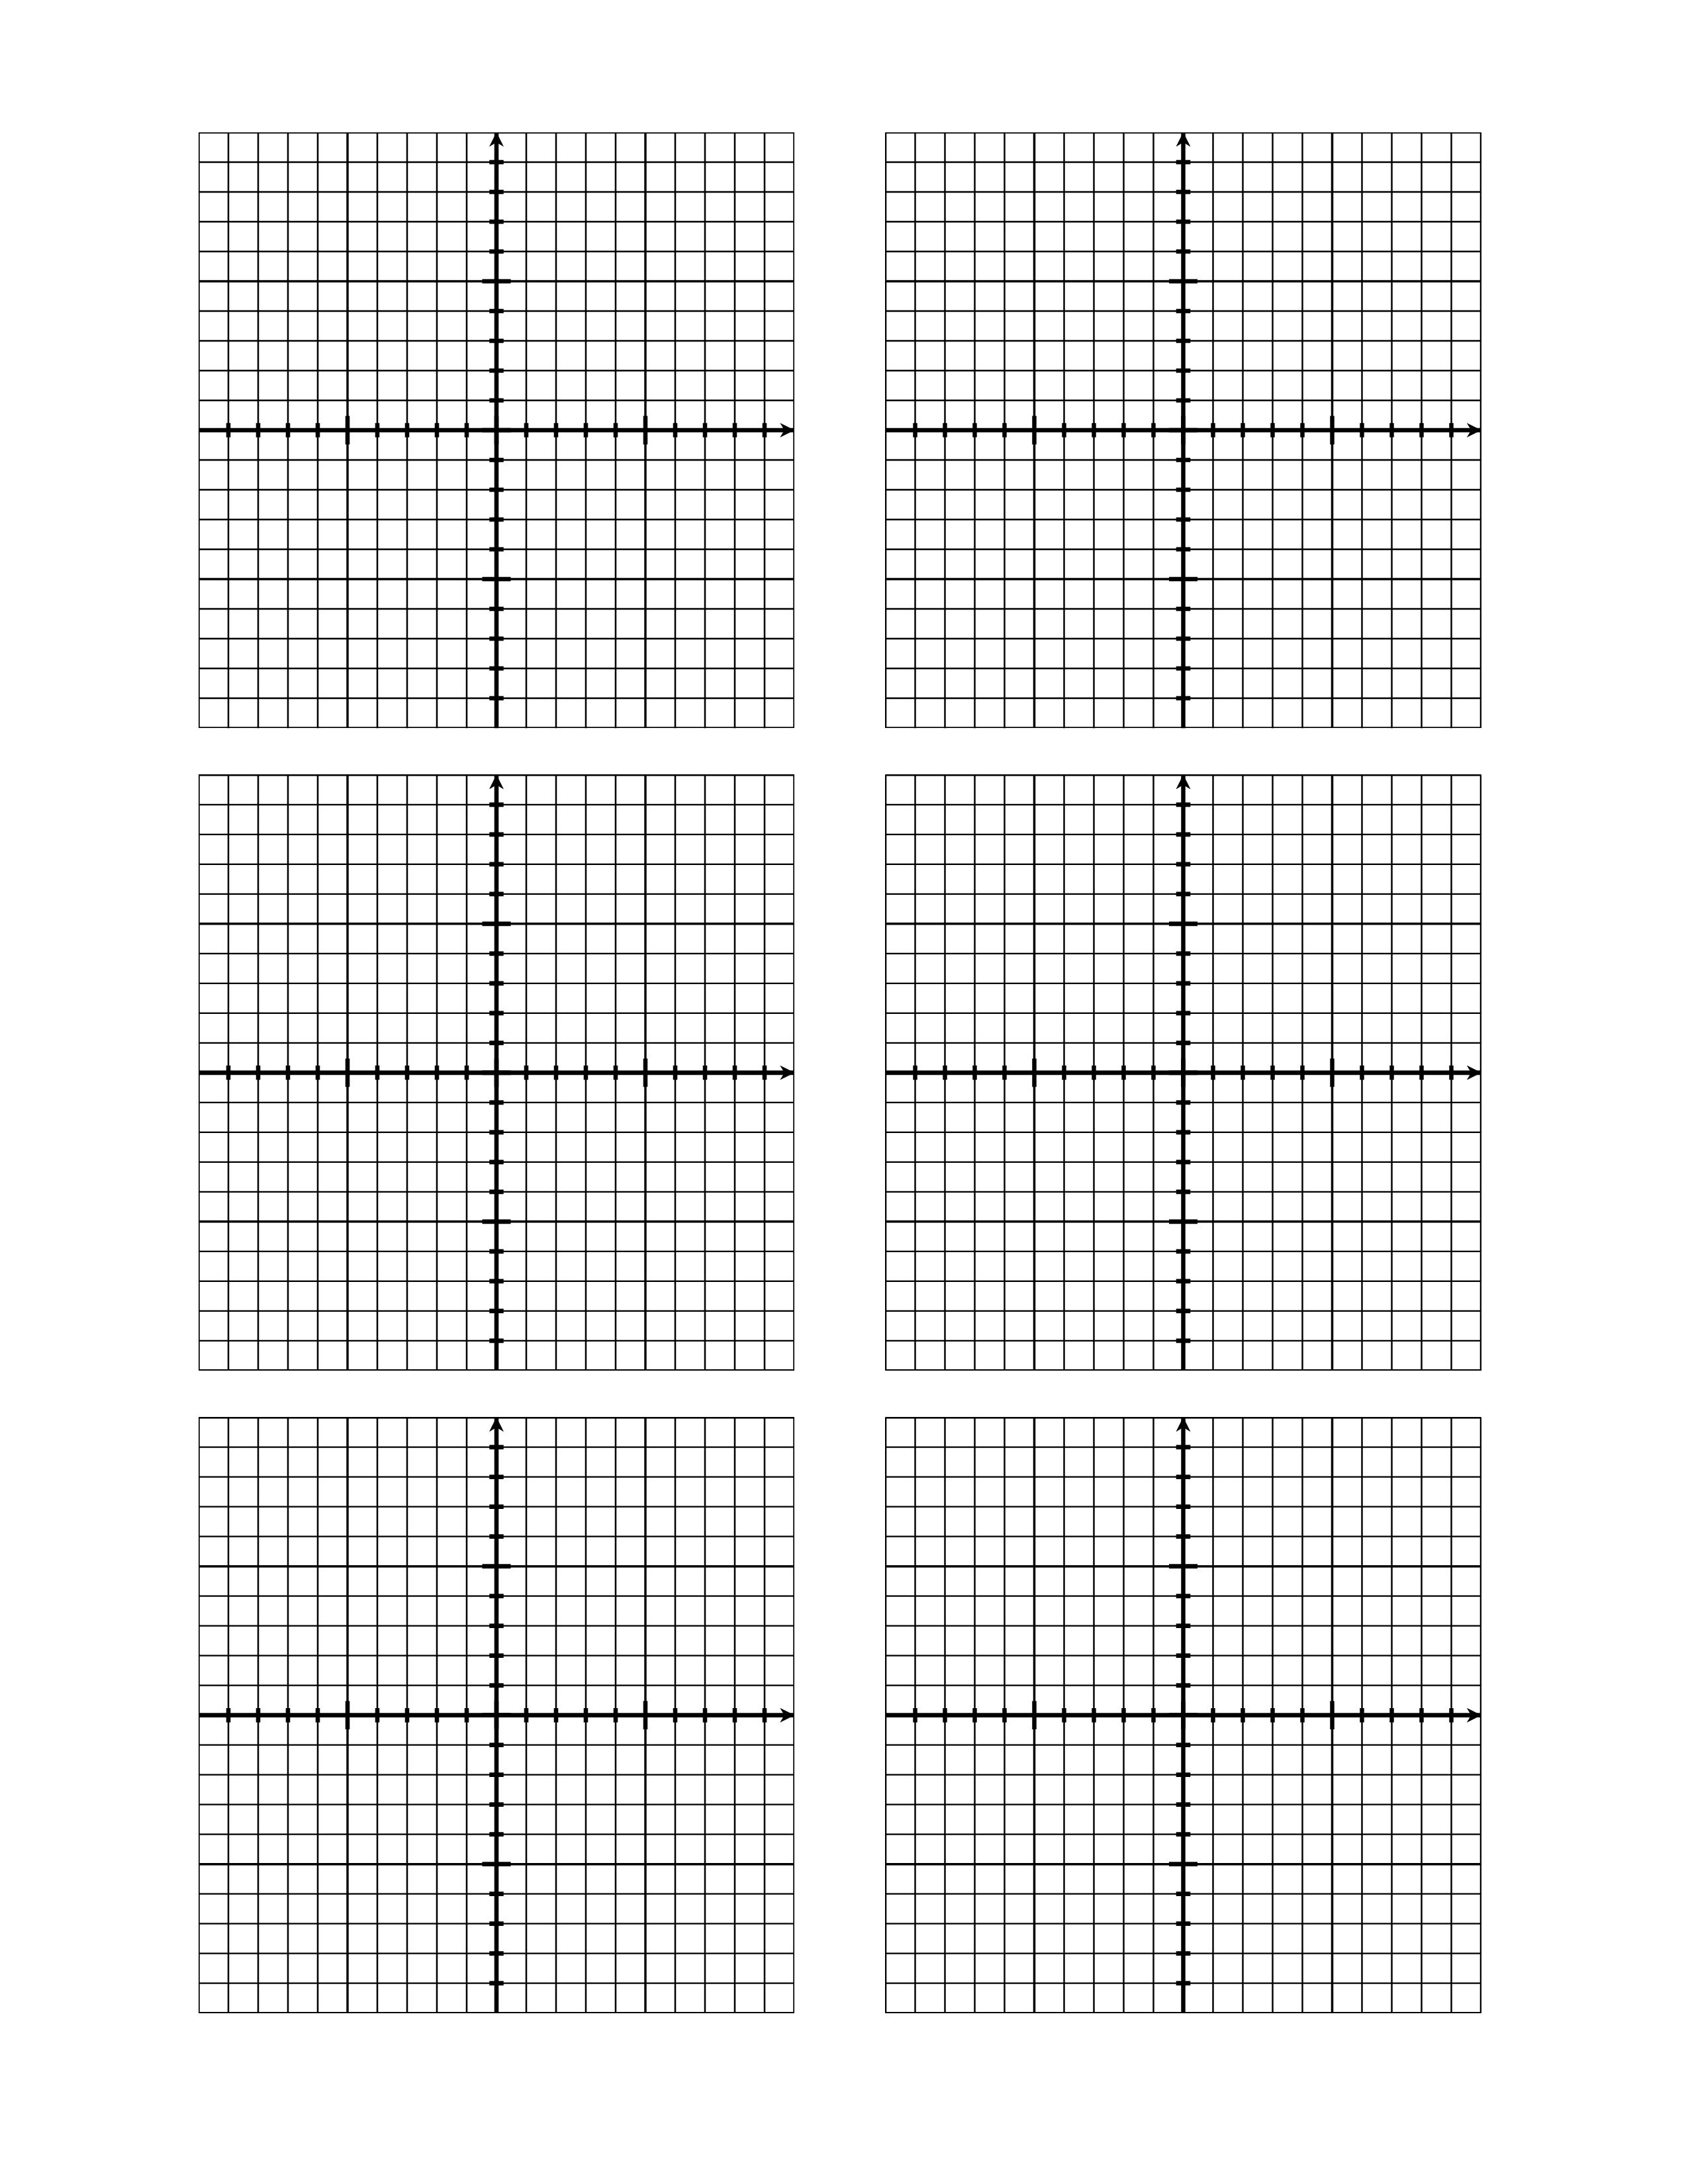 free printable grid graph paper templates at